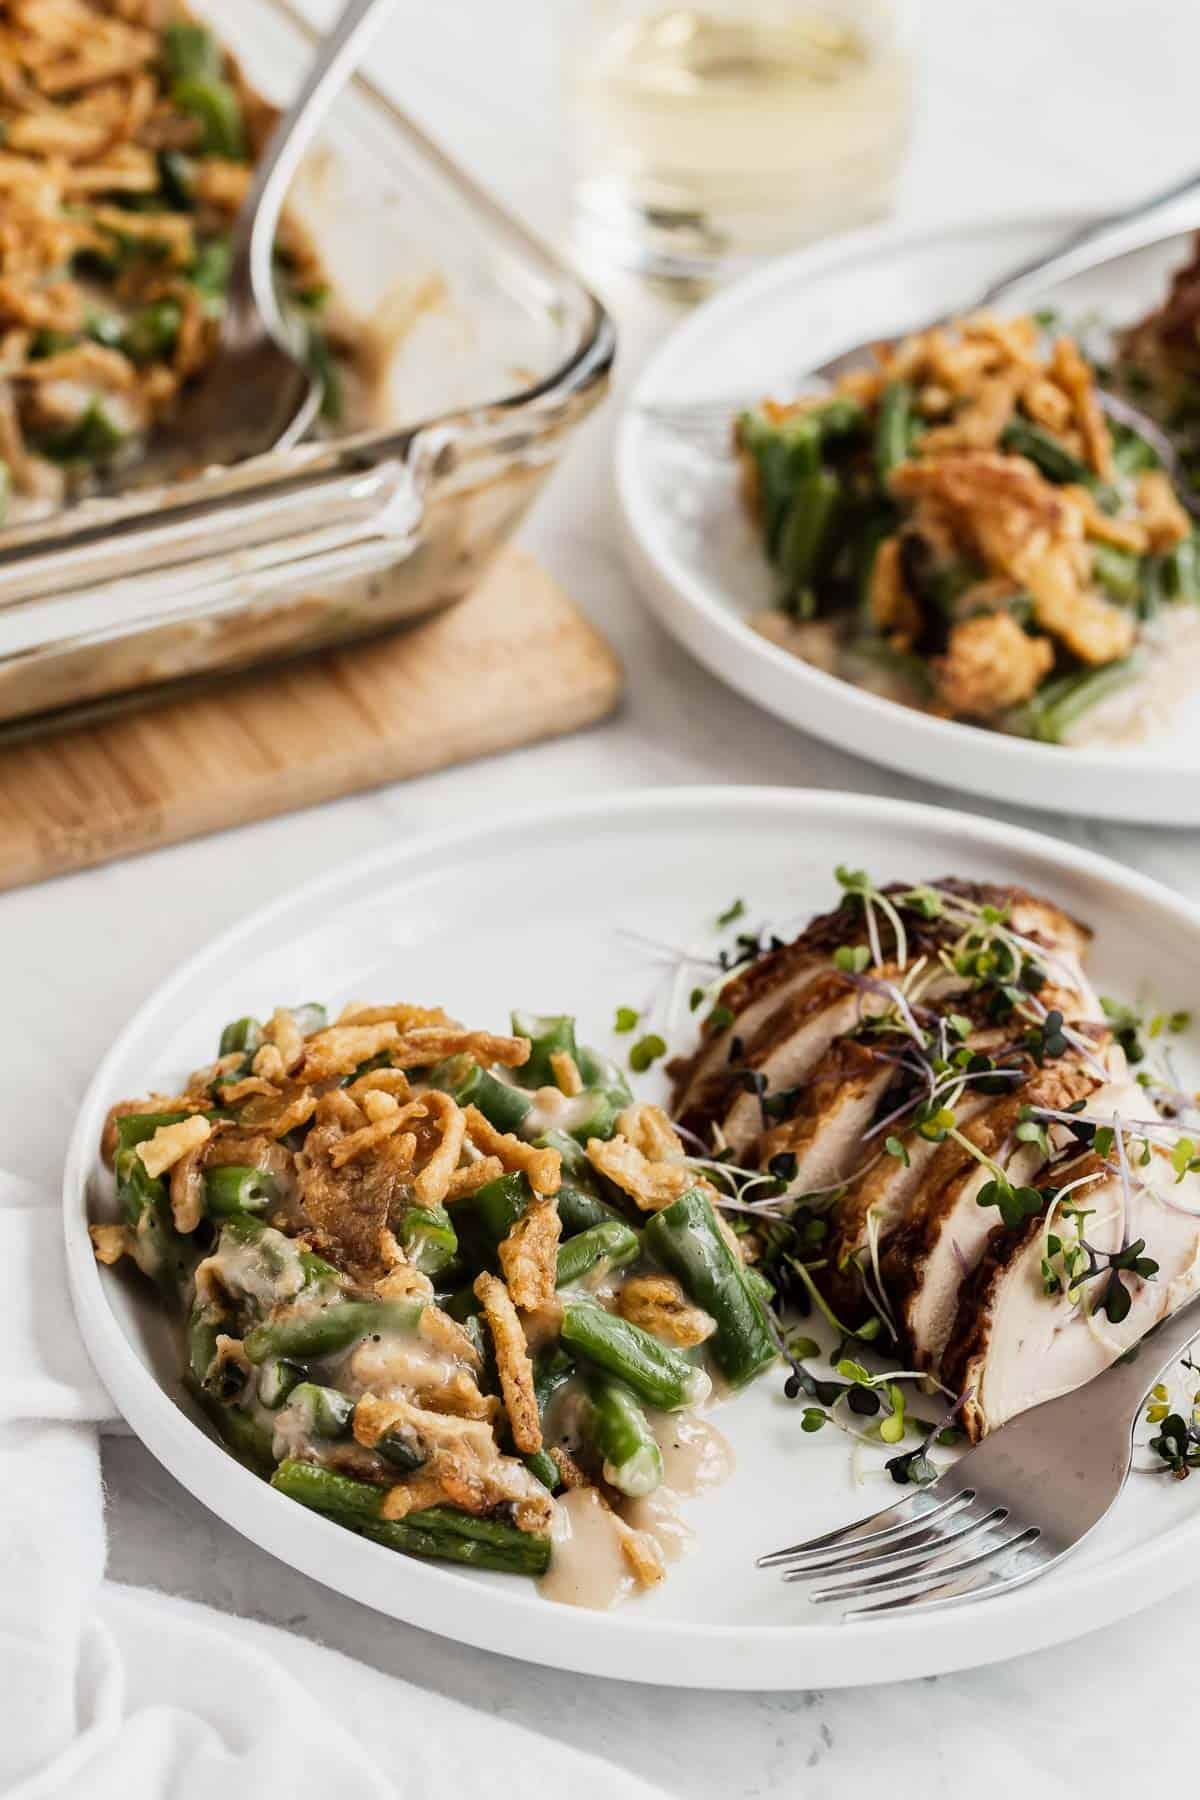 Green bean casserole next to Thanksgiving turkey on two plates.